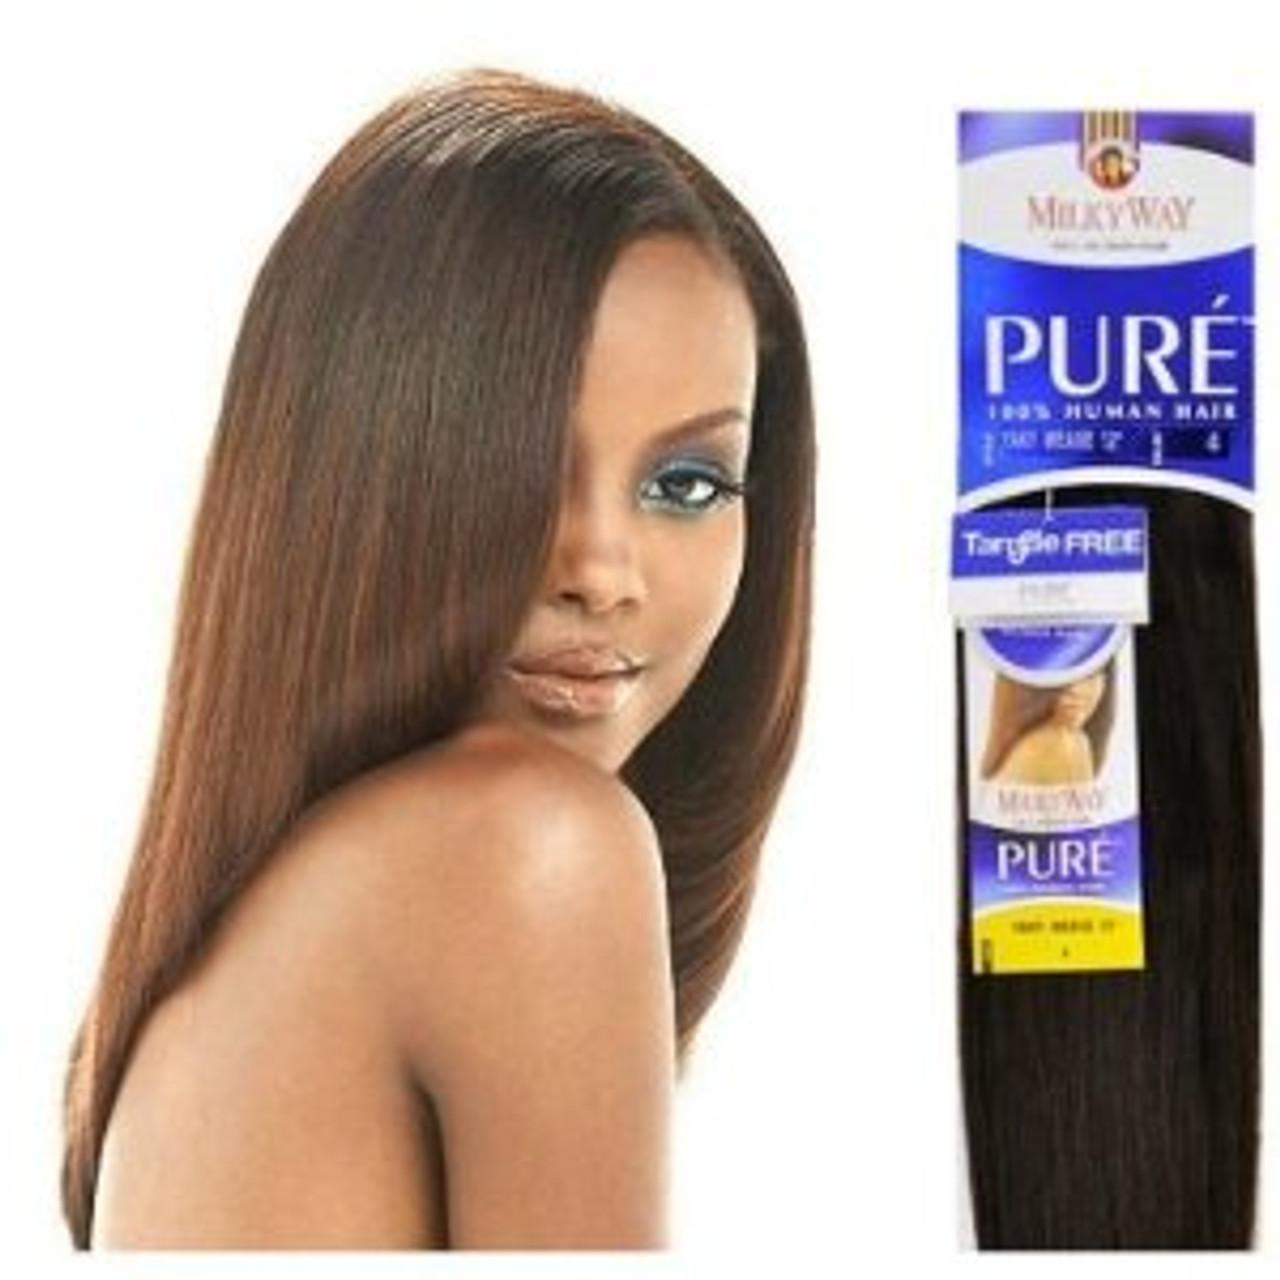 Shake-N-Go Milky Way 100% Human Hair Weave - INDIAN